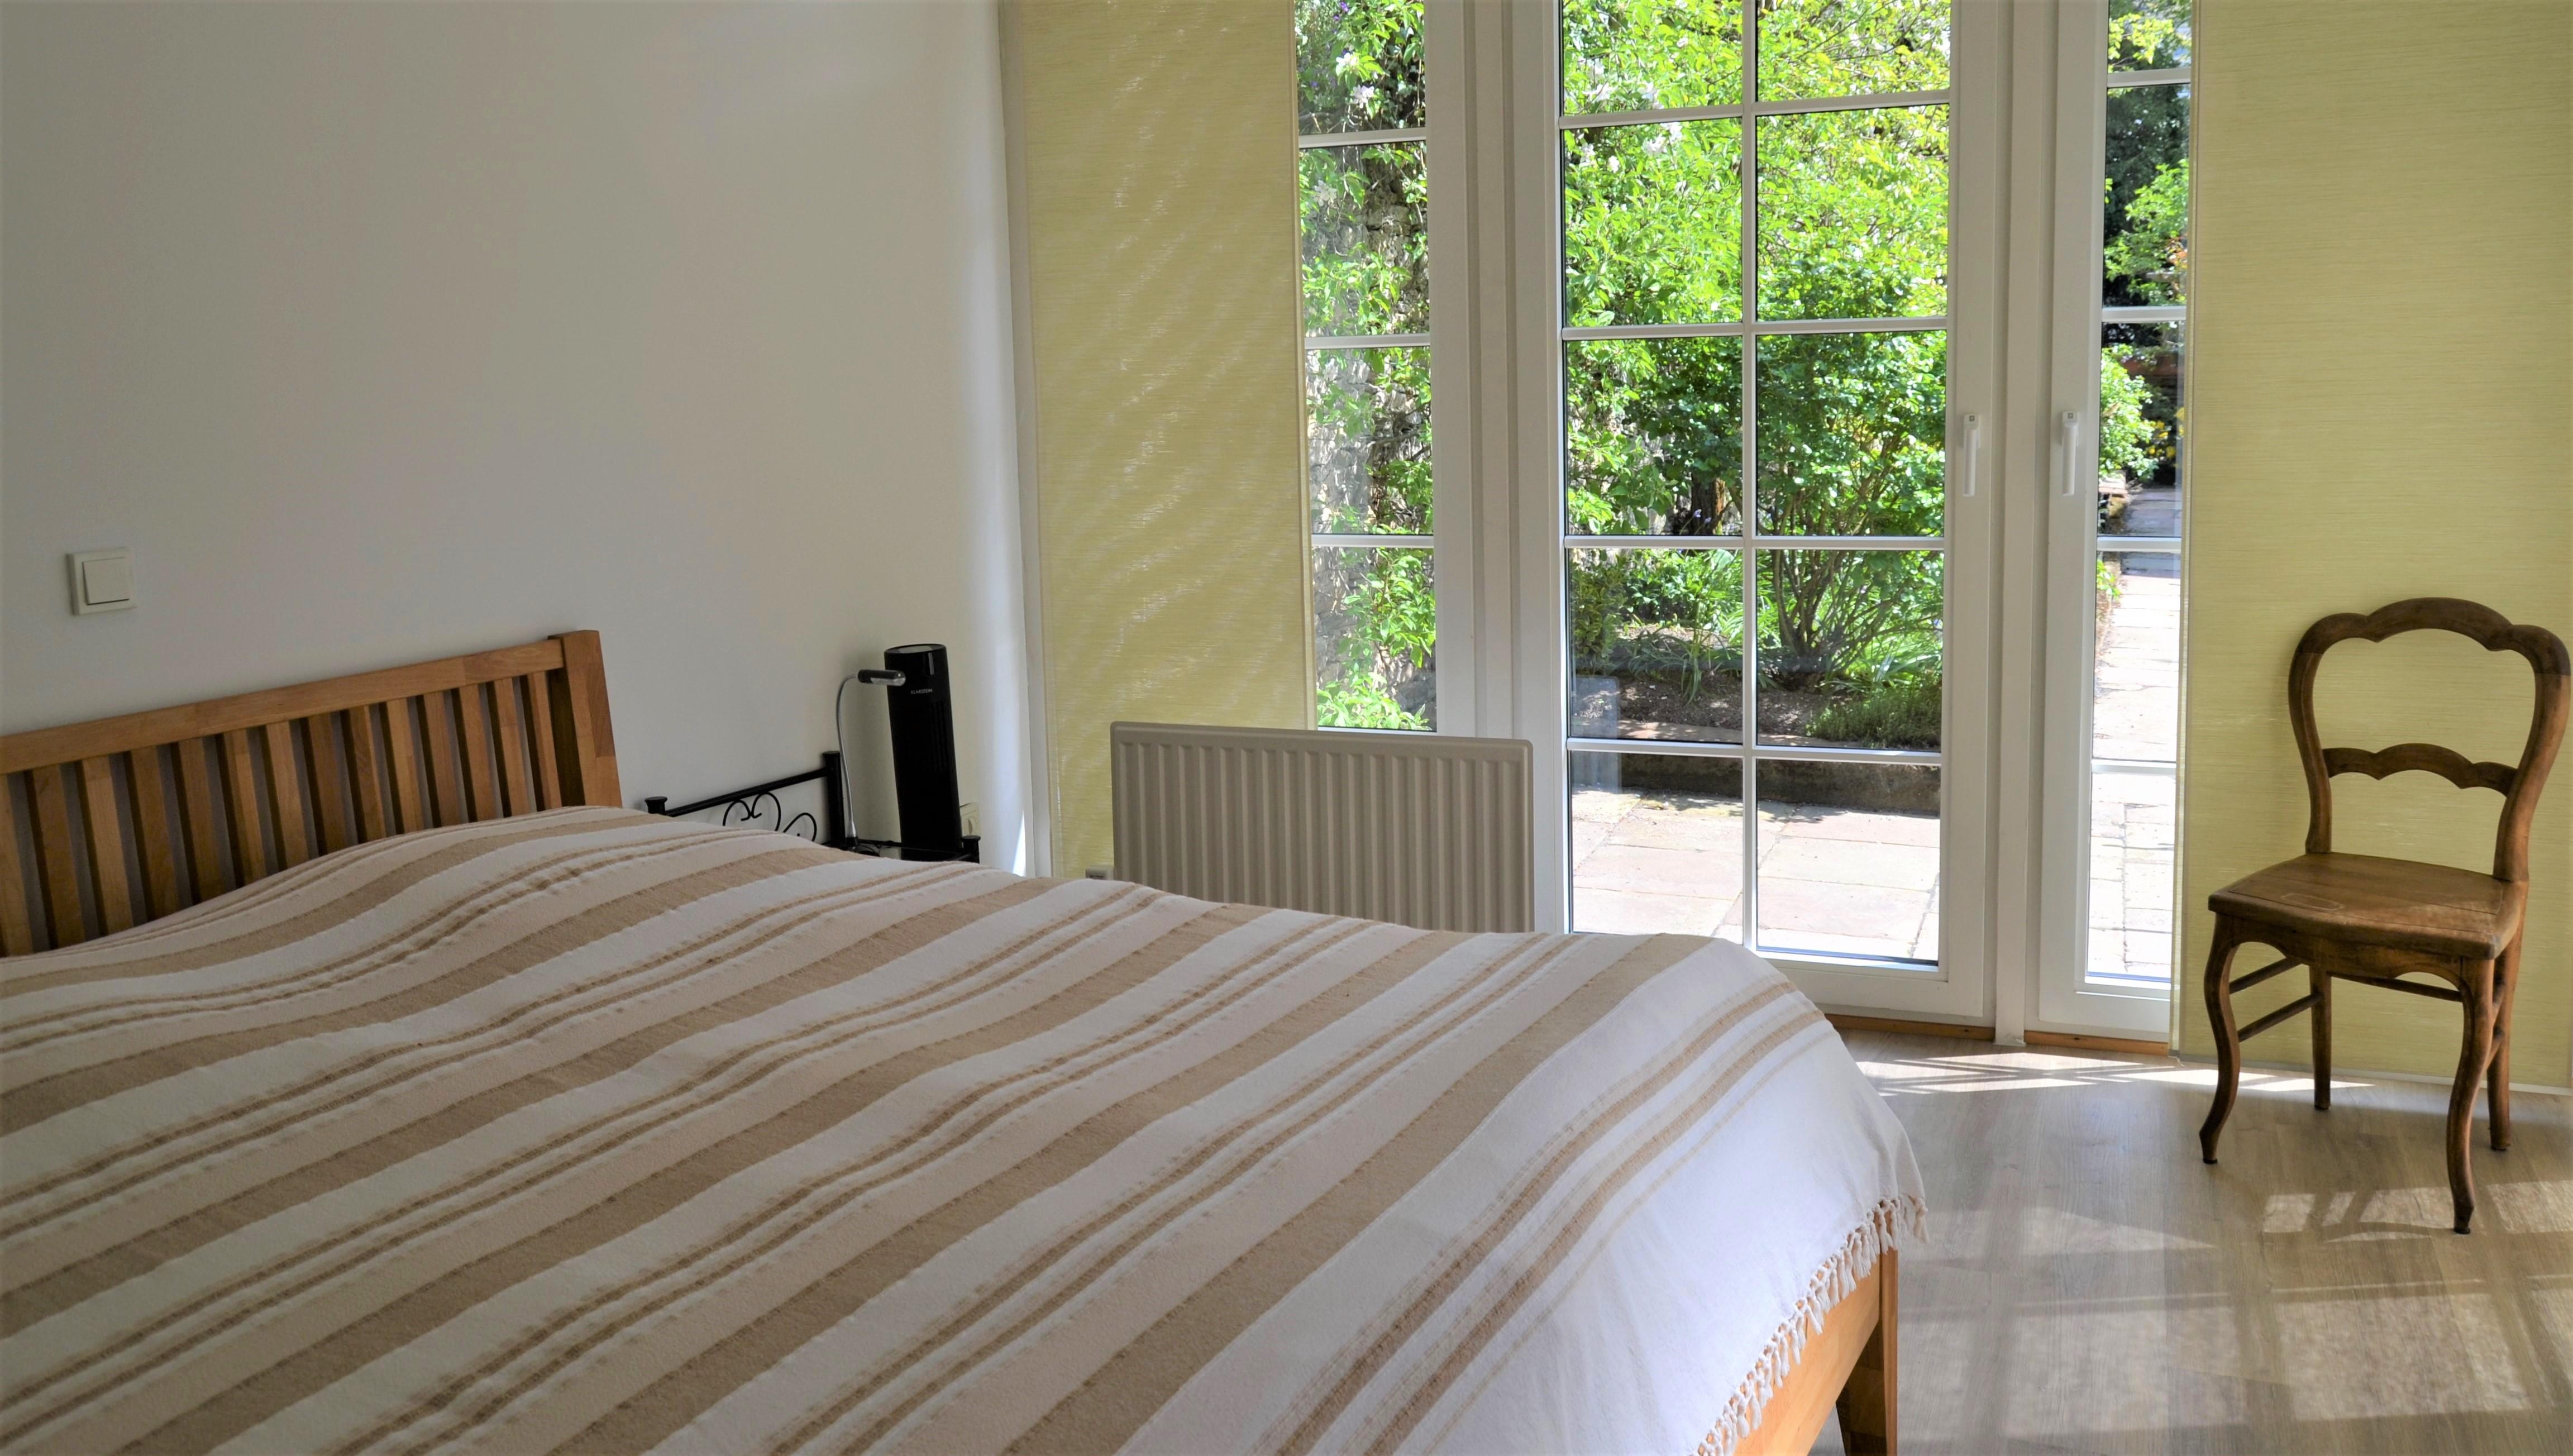 Ferienhaus - Anbau (1)